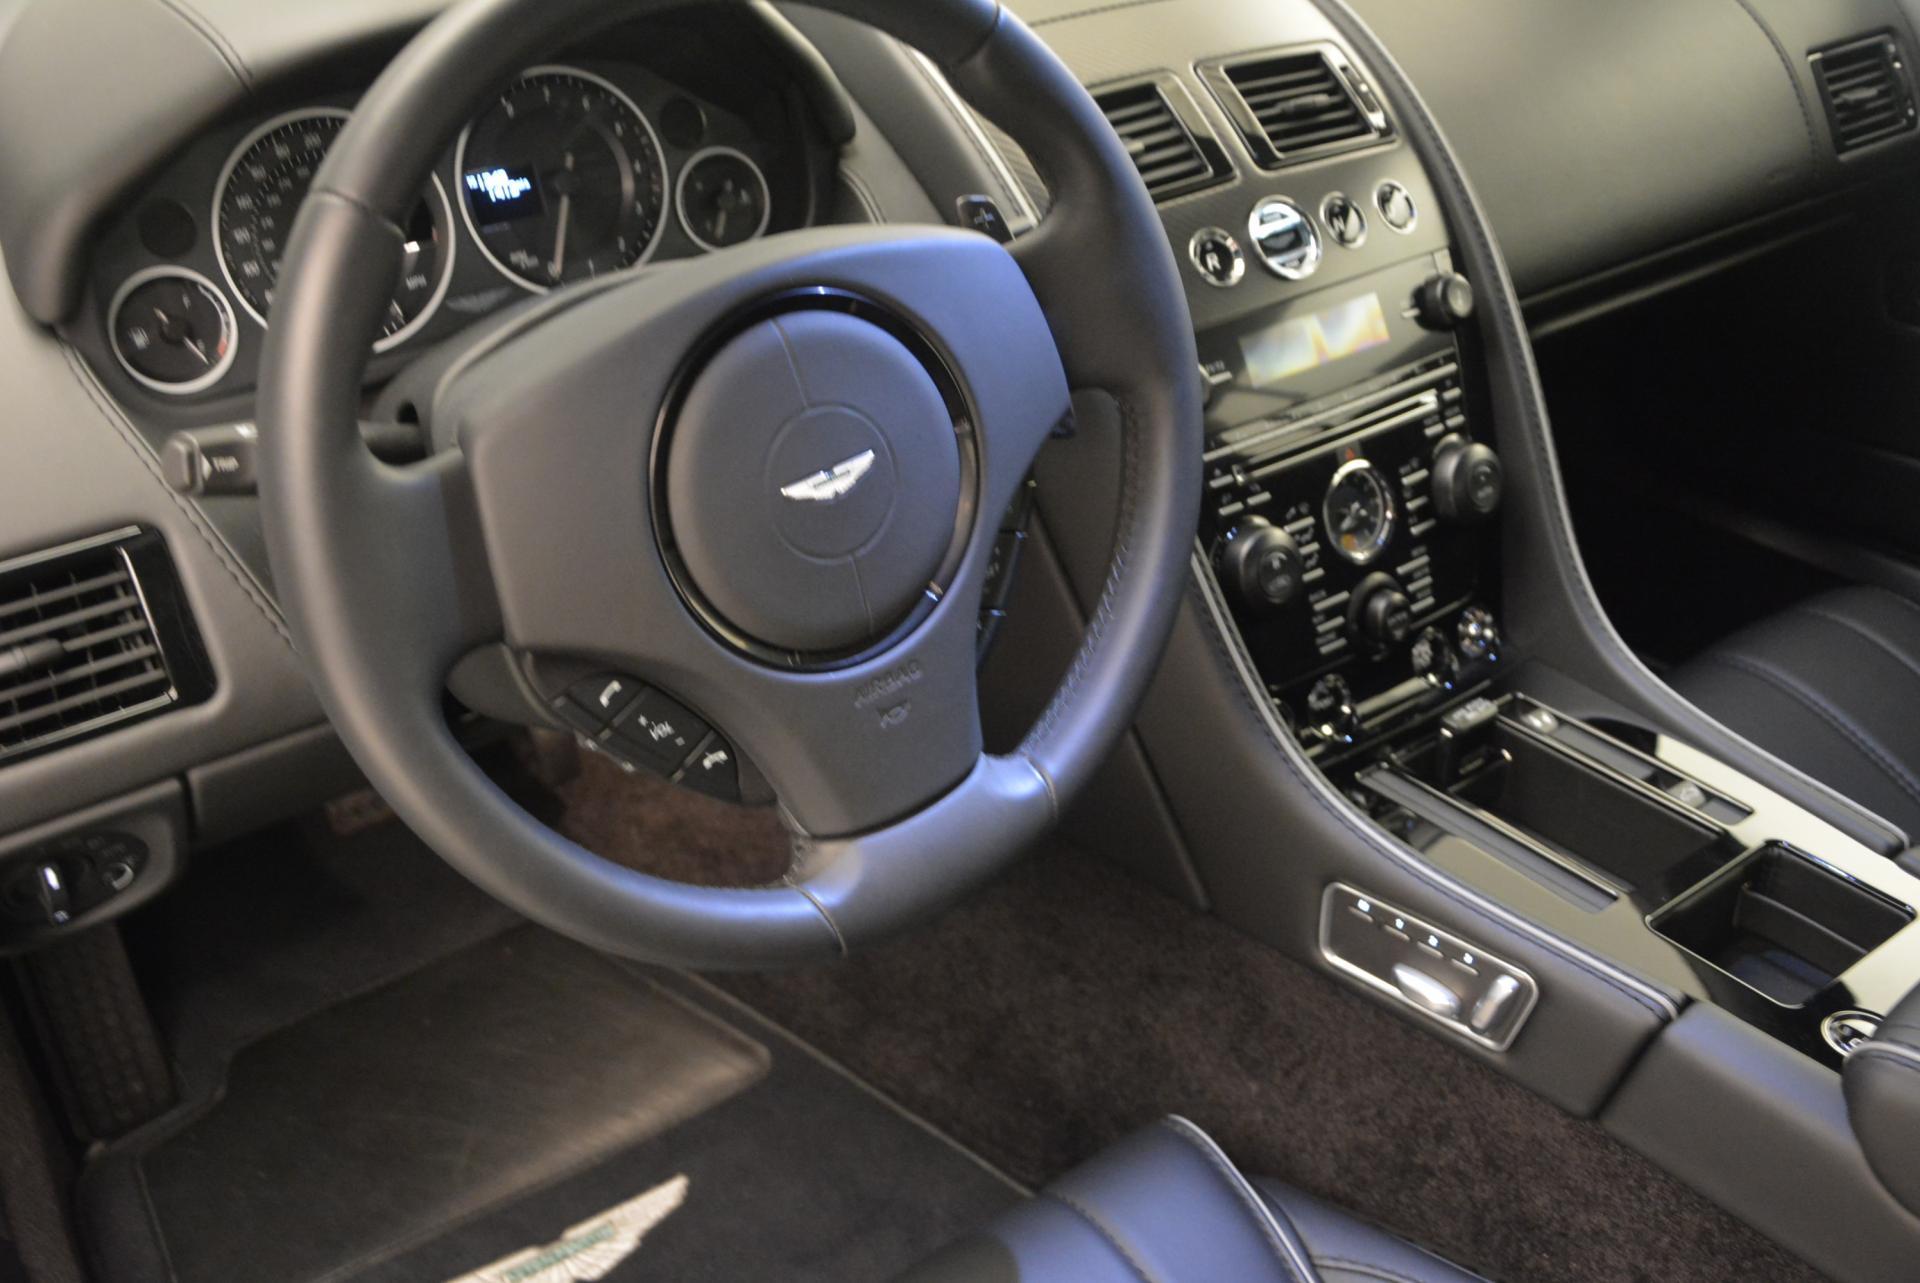 Used 2015 Aston Martin DB9 Carbon Edition For Sale In Greenwich, CT. Alfa Romeo of Greenwich, 7349 528_p15